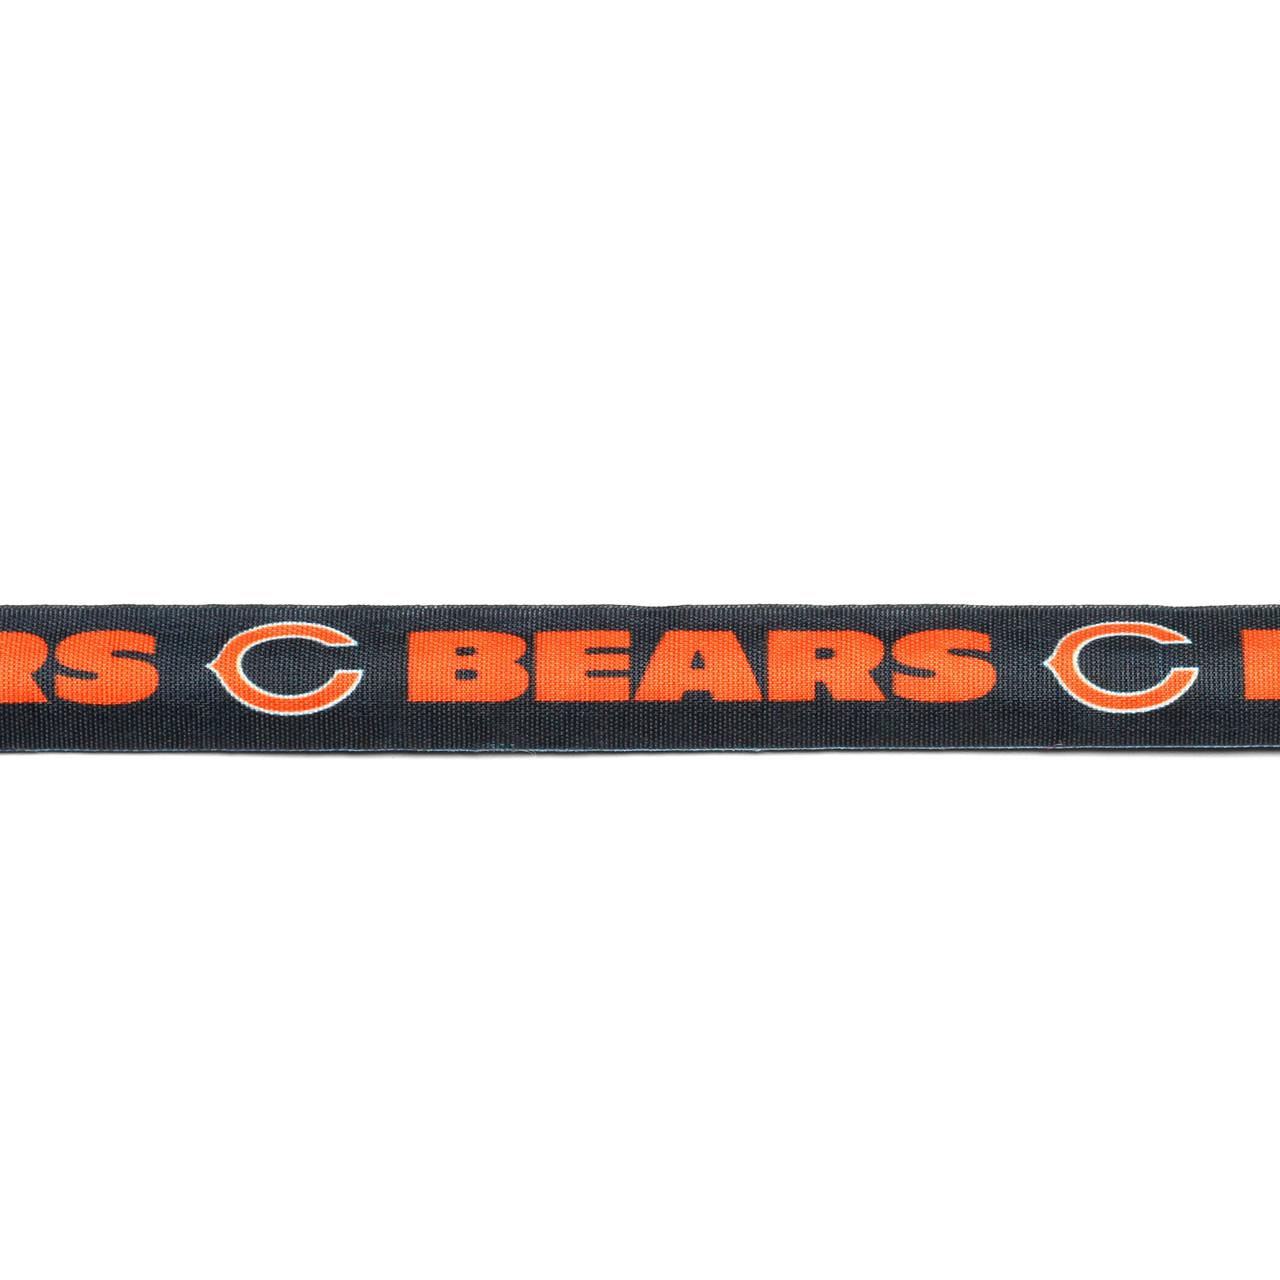 hot sales 98df7 c3a6d NFL-CHICAGO BEARS Team Retractable Hose